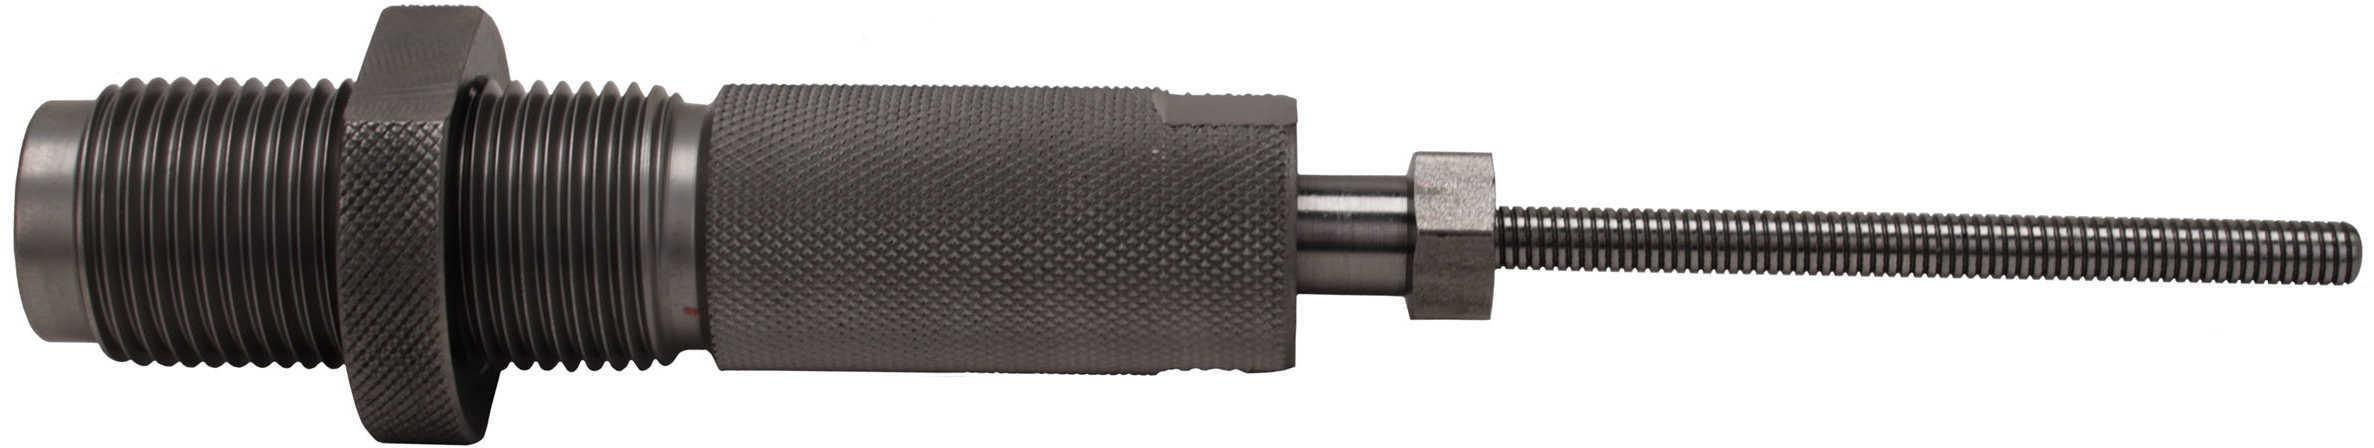 Hornady Full Length Die 7mm Remington Ultra Magnum Md: 046454